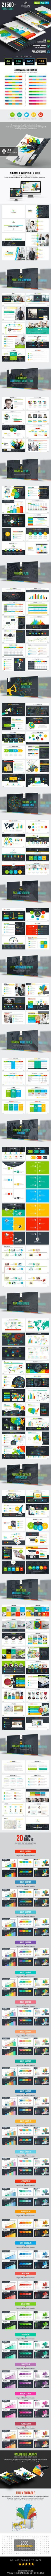 MaxPro - Business Plan PowerPoint Presentation Template #powerpoint #presentation Download: http://graphicriver.net/item/maxpro-business-plan-powerpoint-presentation/11541787?ref=ksioks